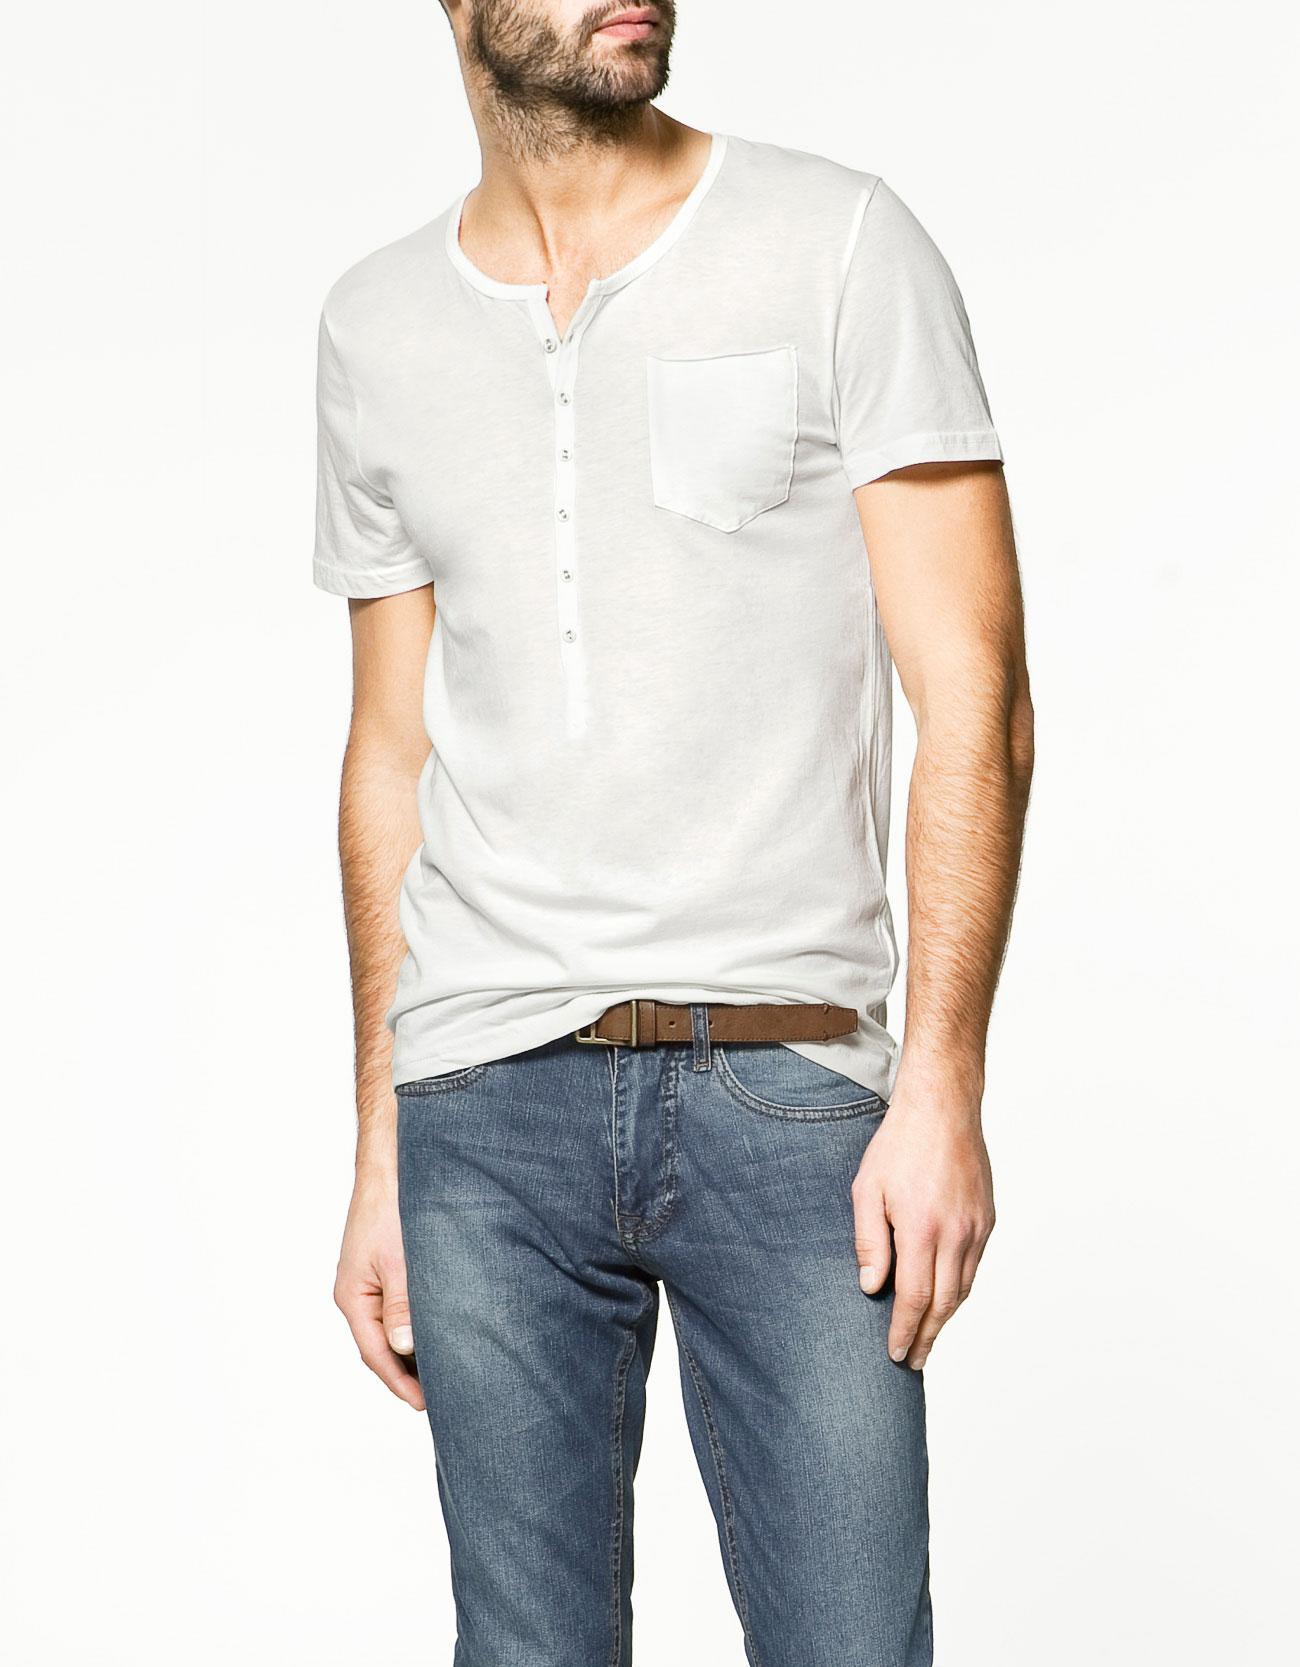 Zara button neck t shirt in white for men lyst for Button collar t shirt